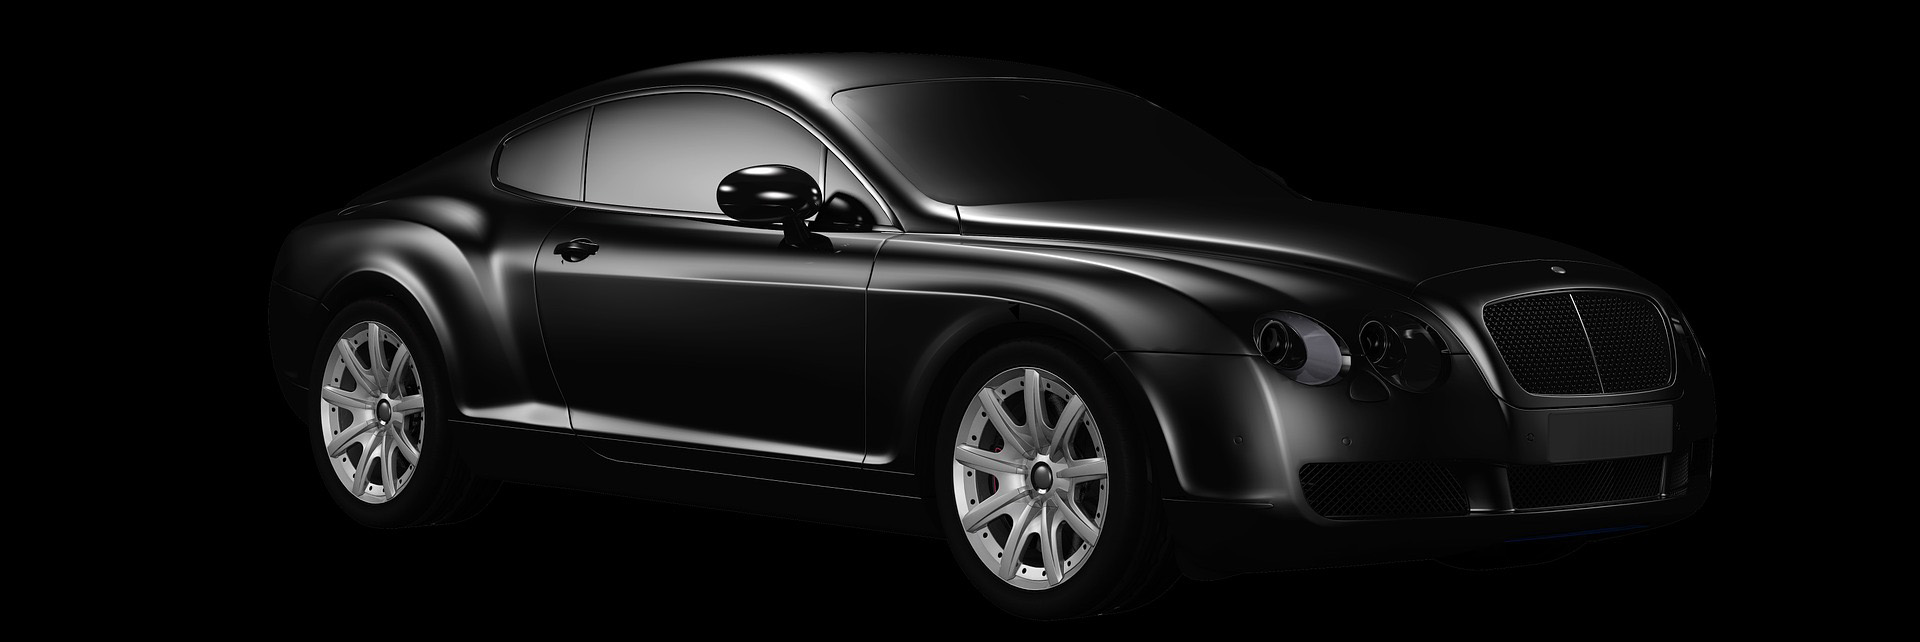 Slide voiture noire